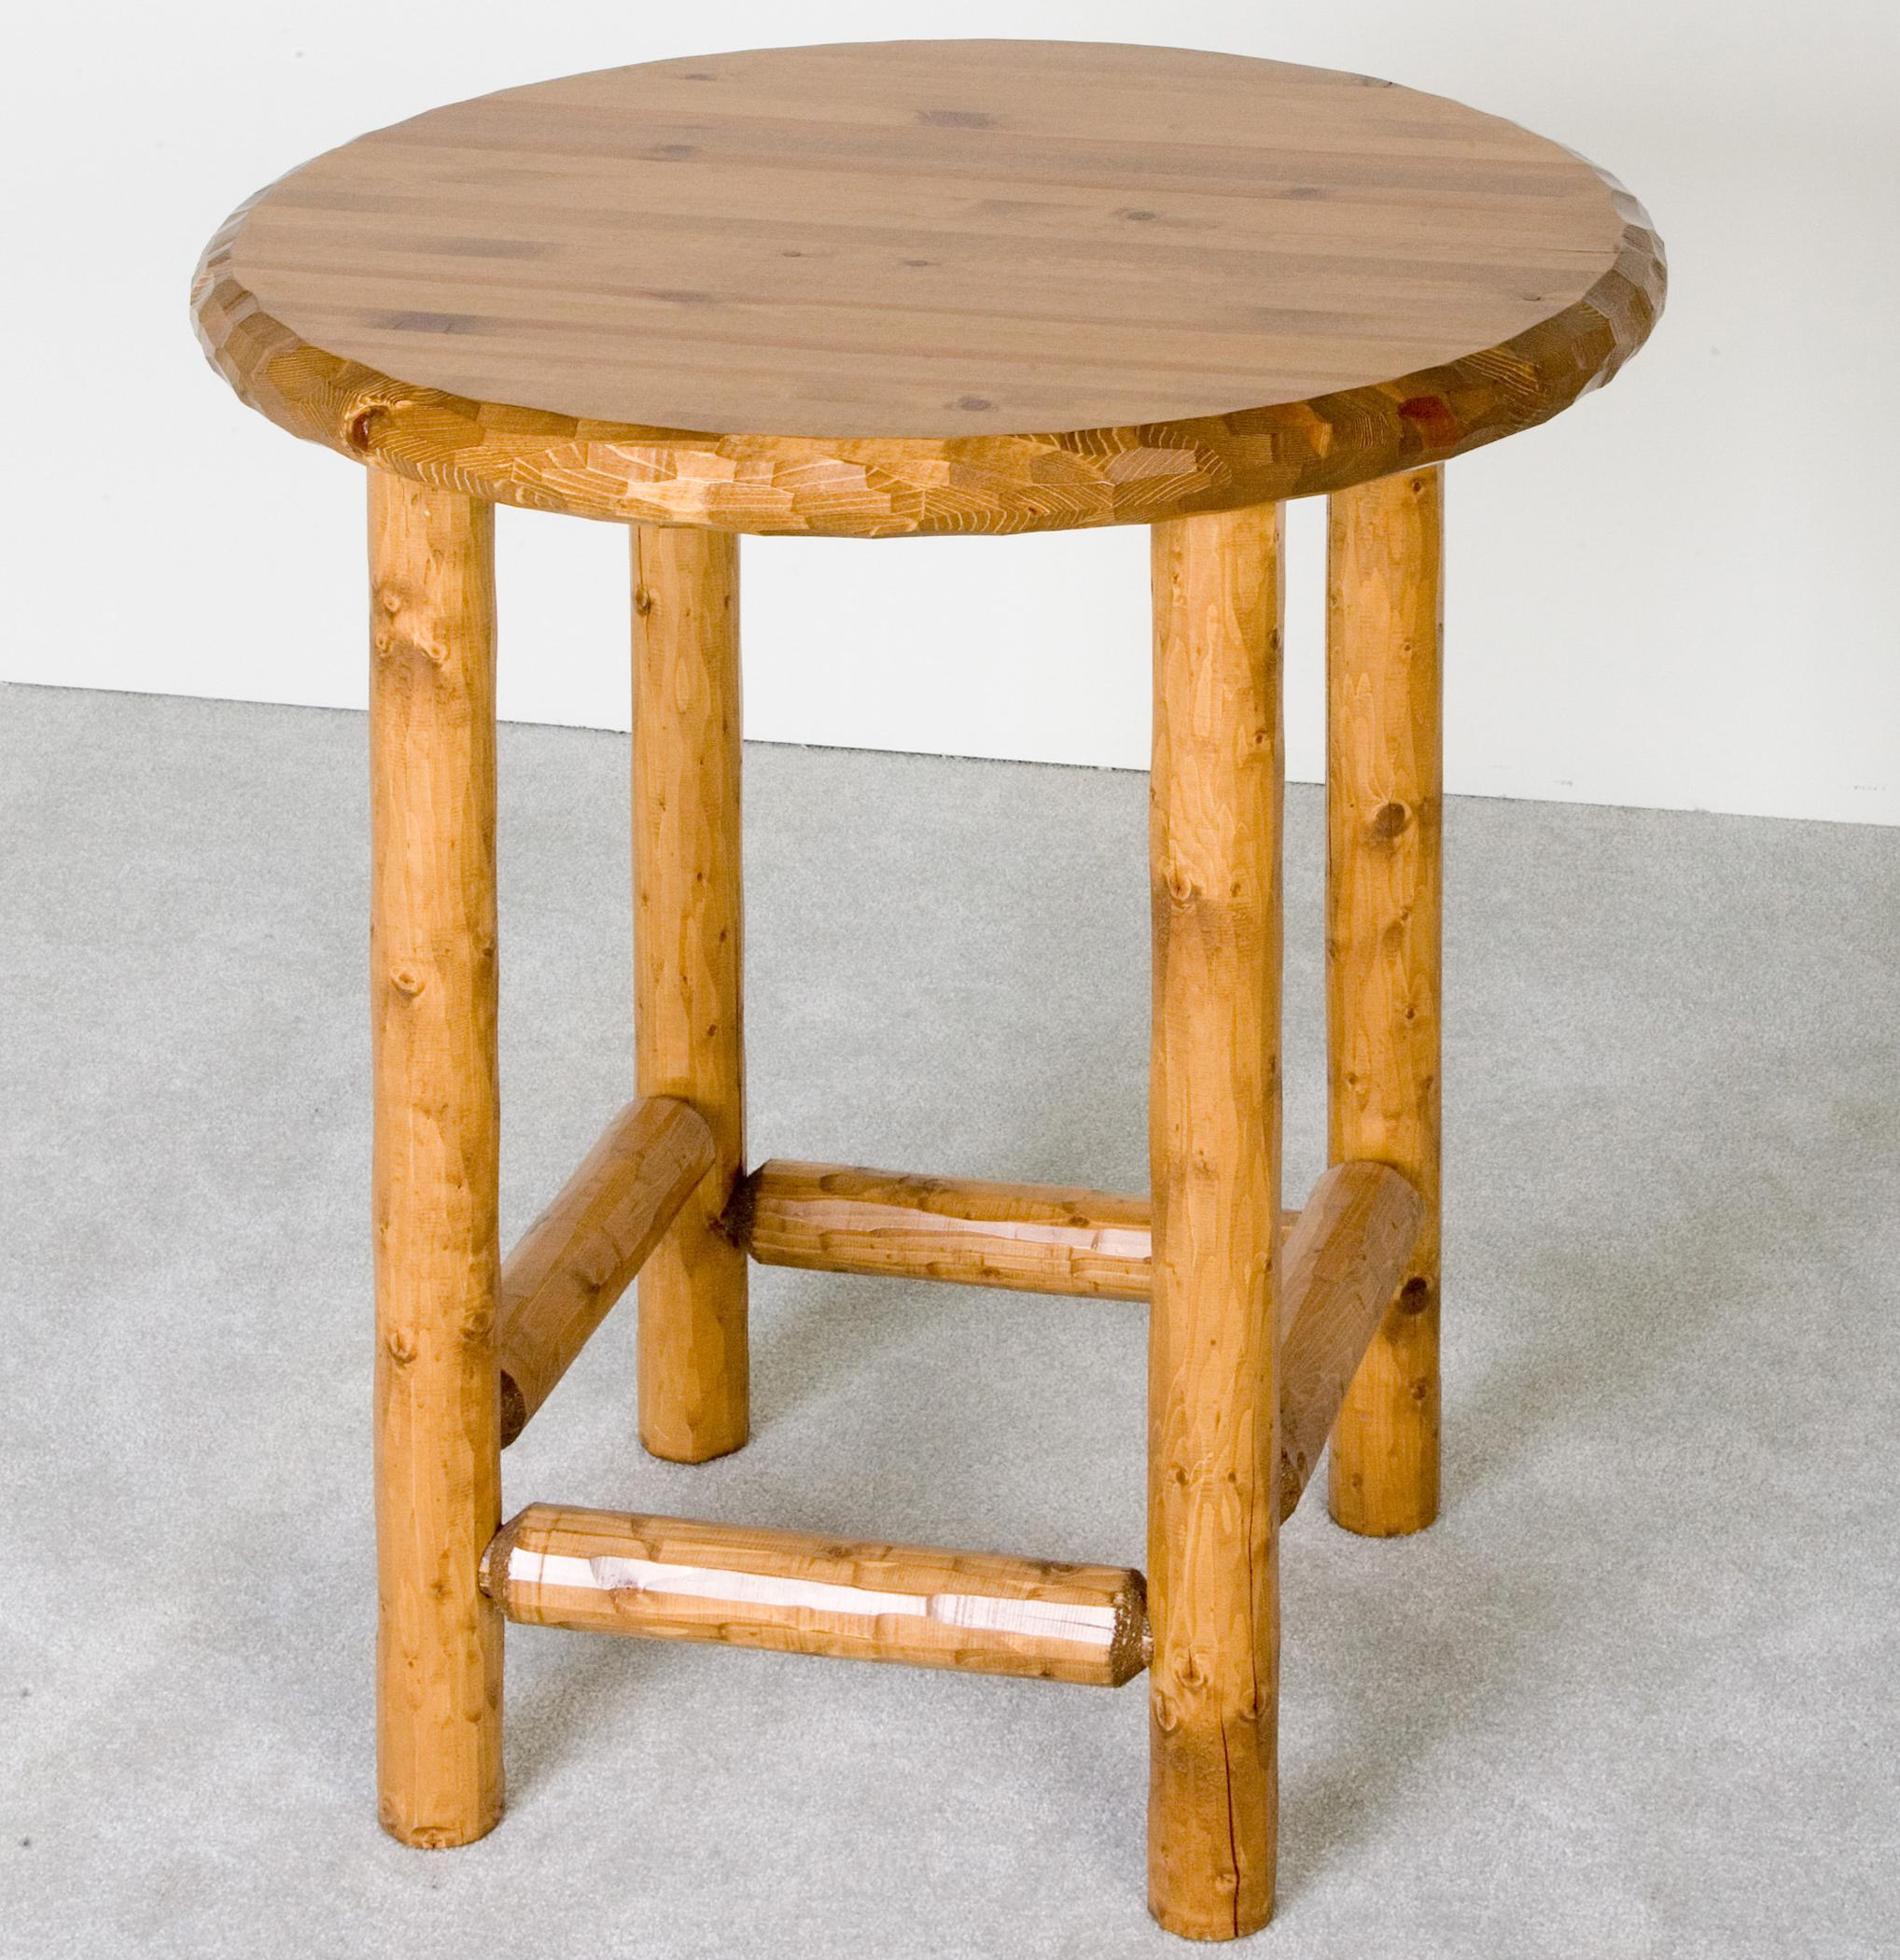 NorthShore by Becker Log Furniture Log Pub Table - Item Number: NWS NPT